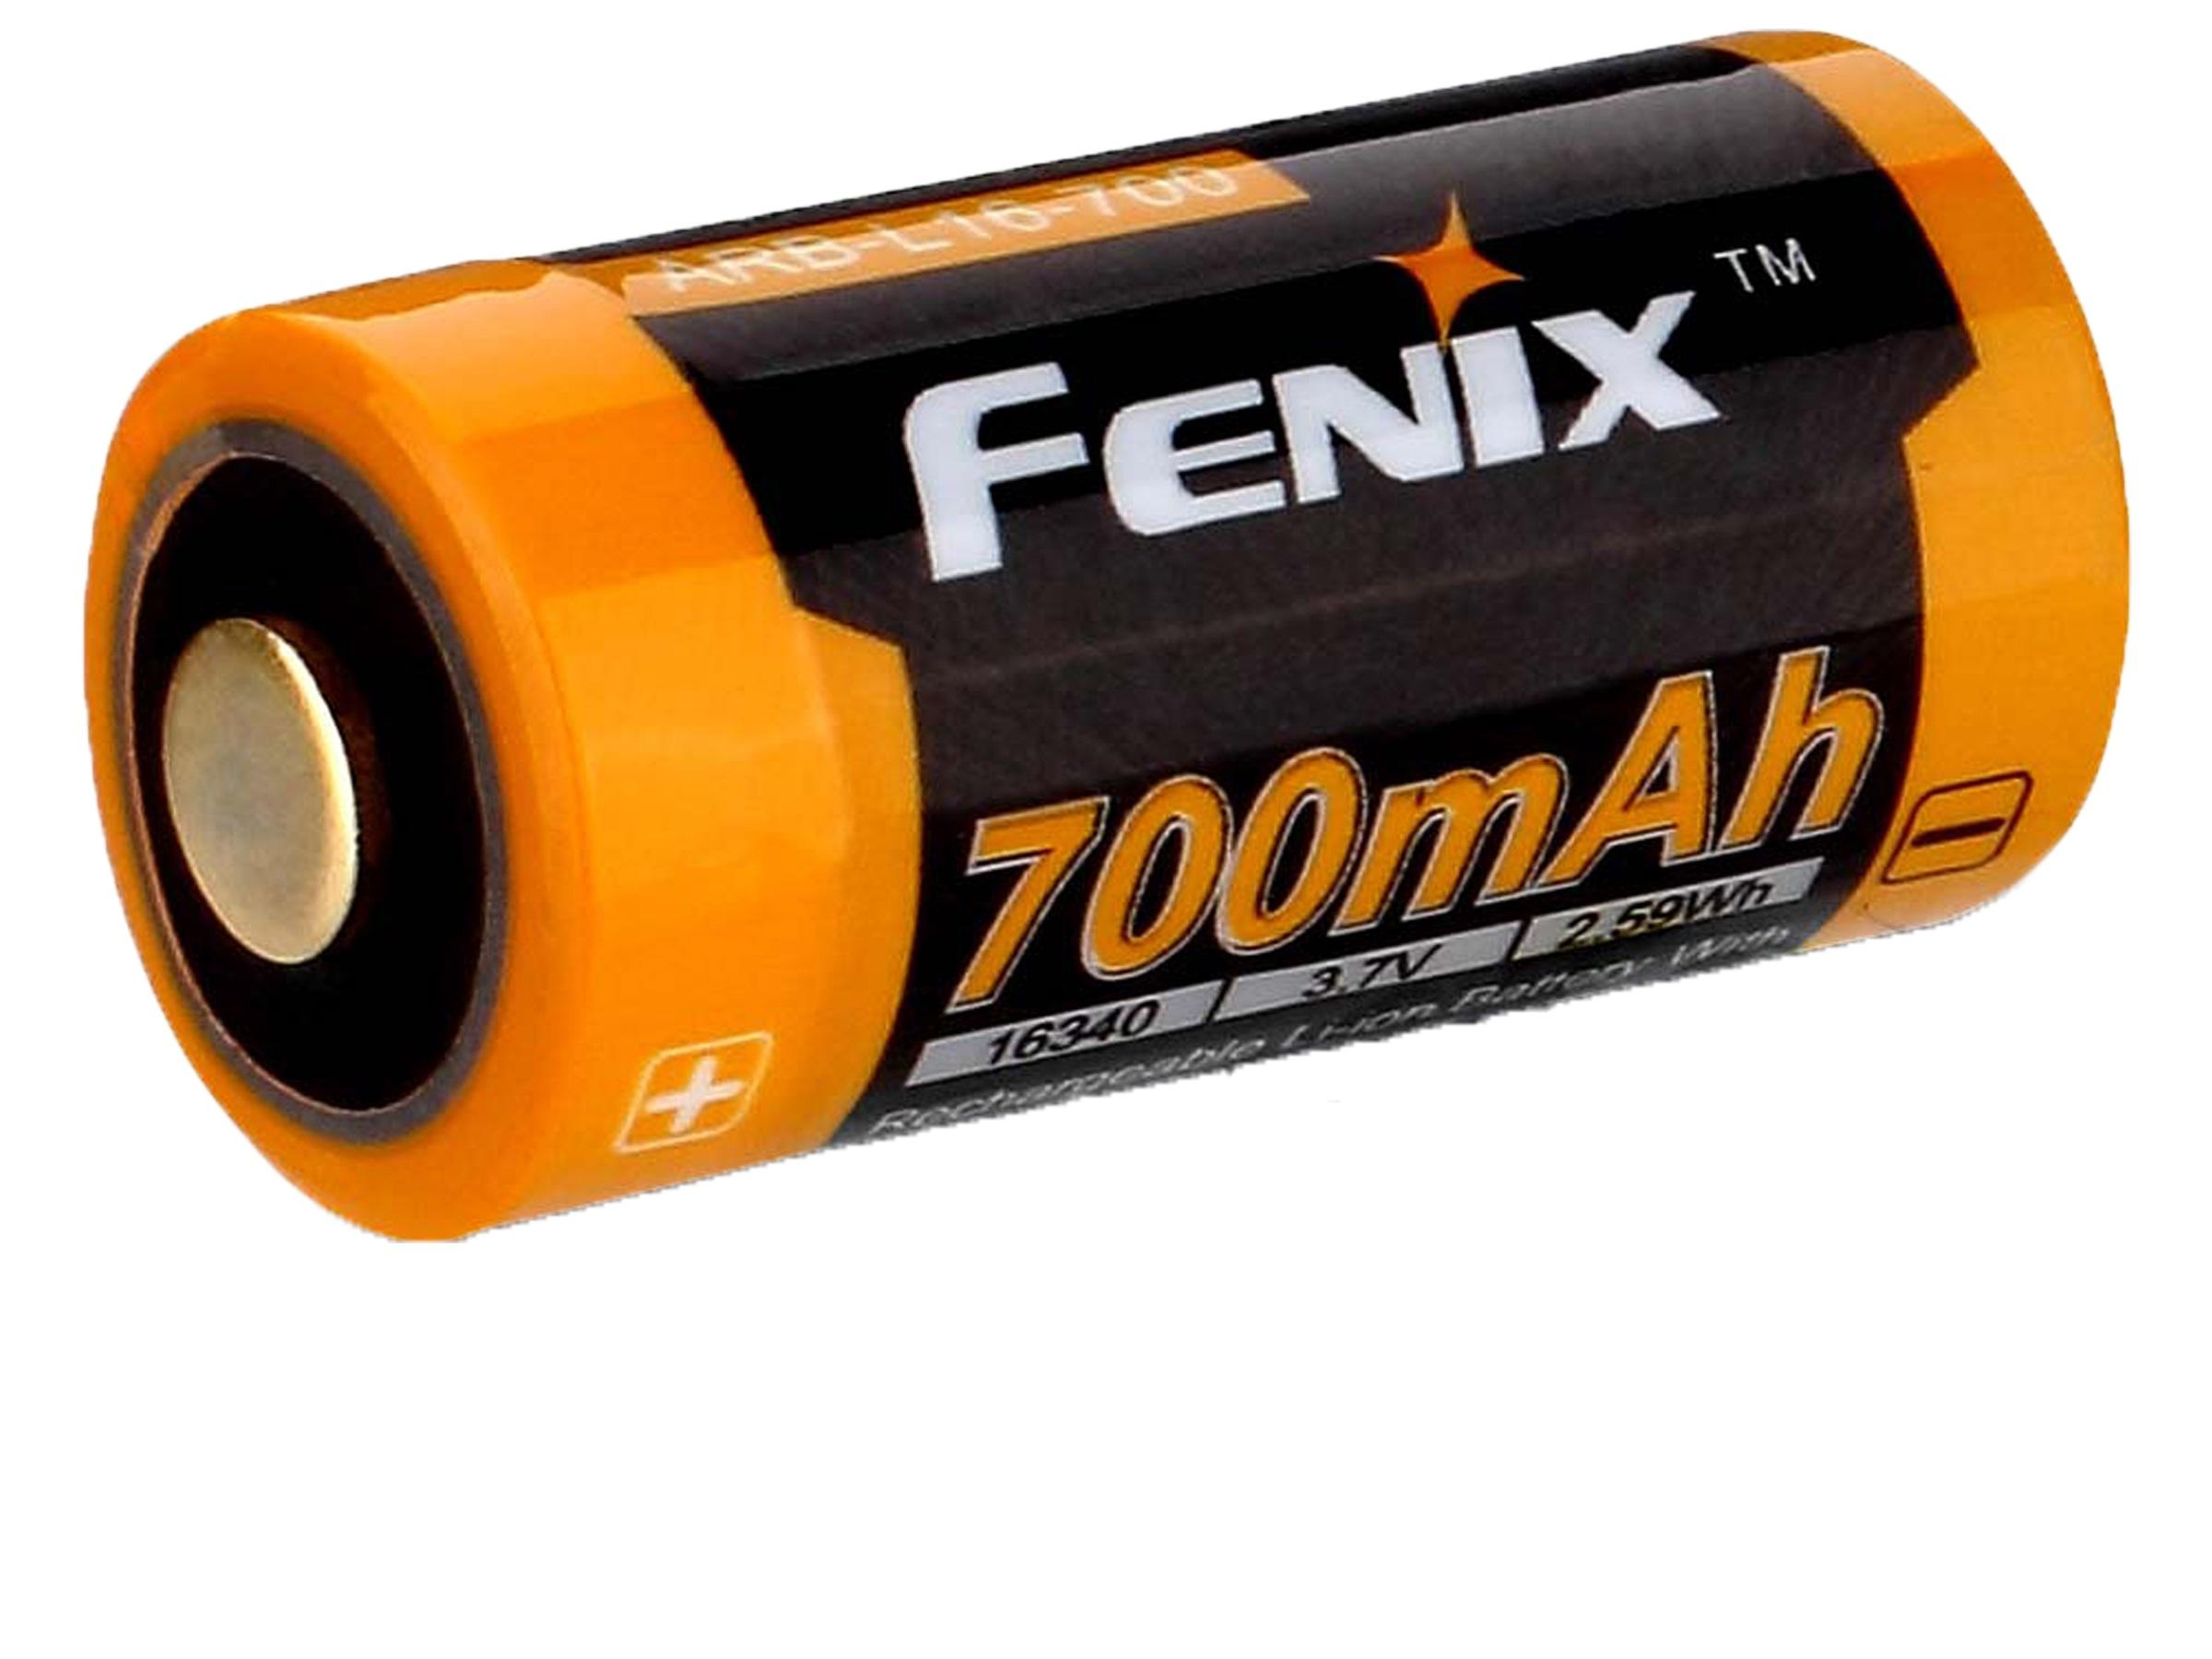 Fenix 16340 - 700mAh - Acumulator - ARB-L 16-700